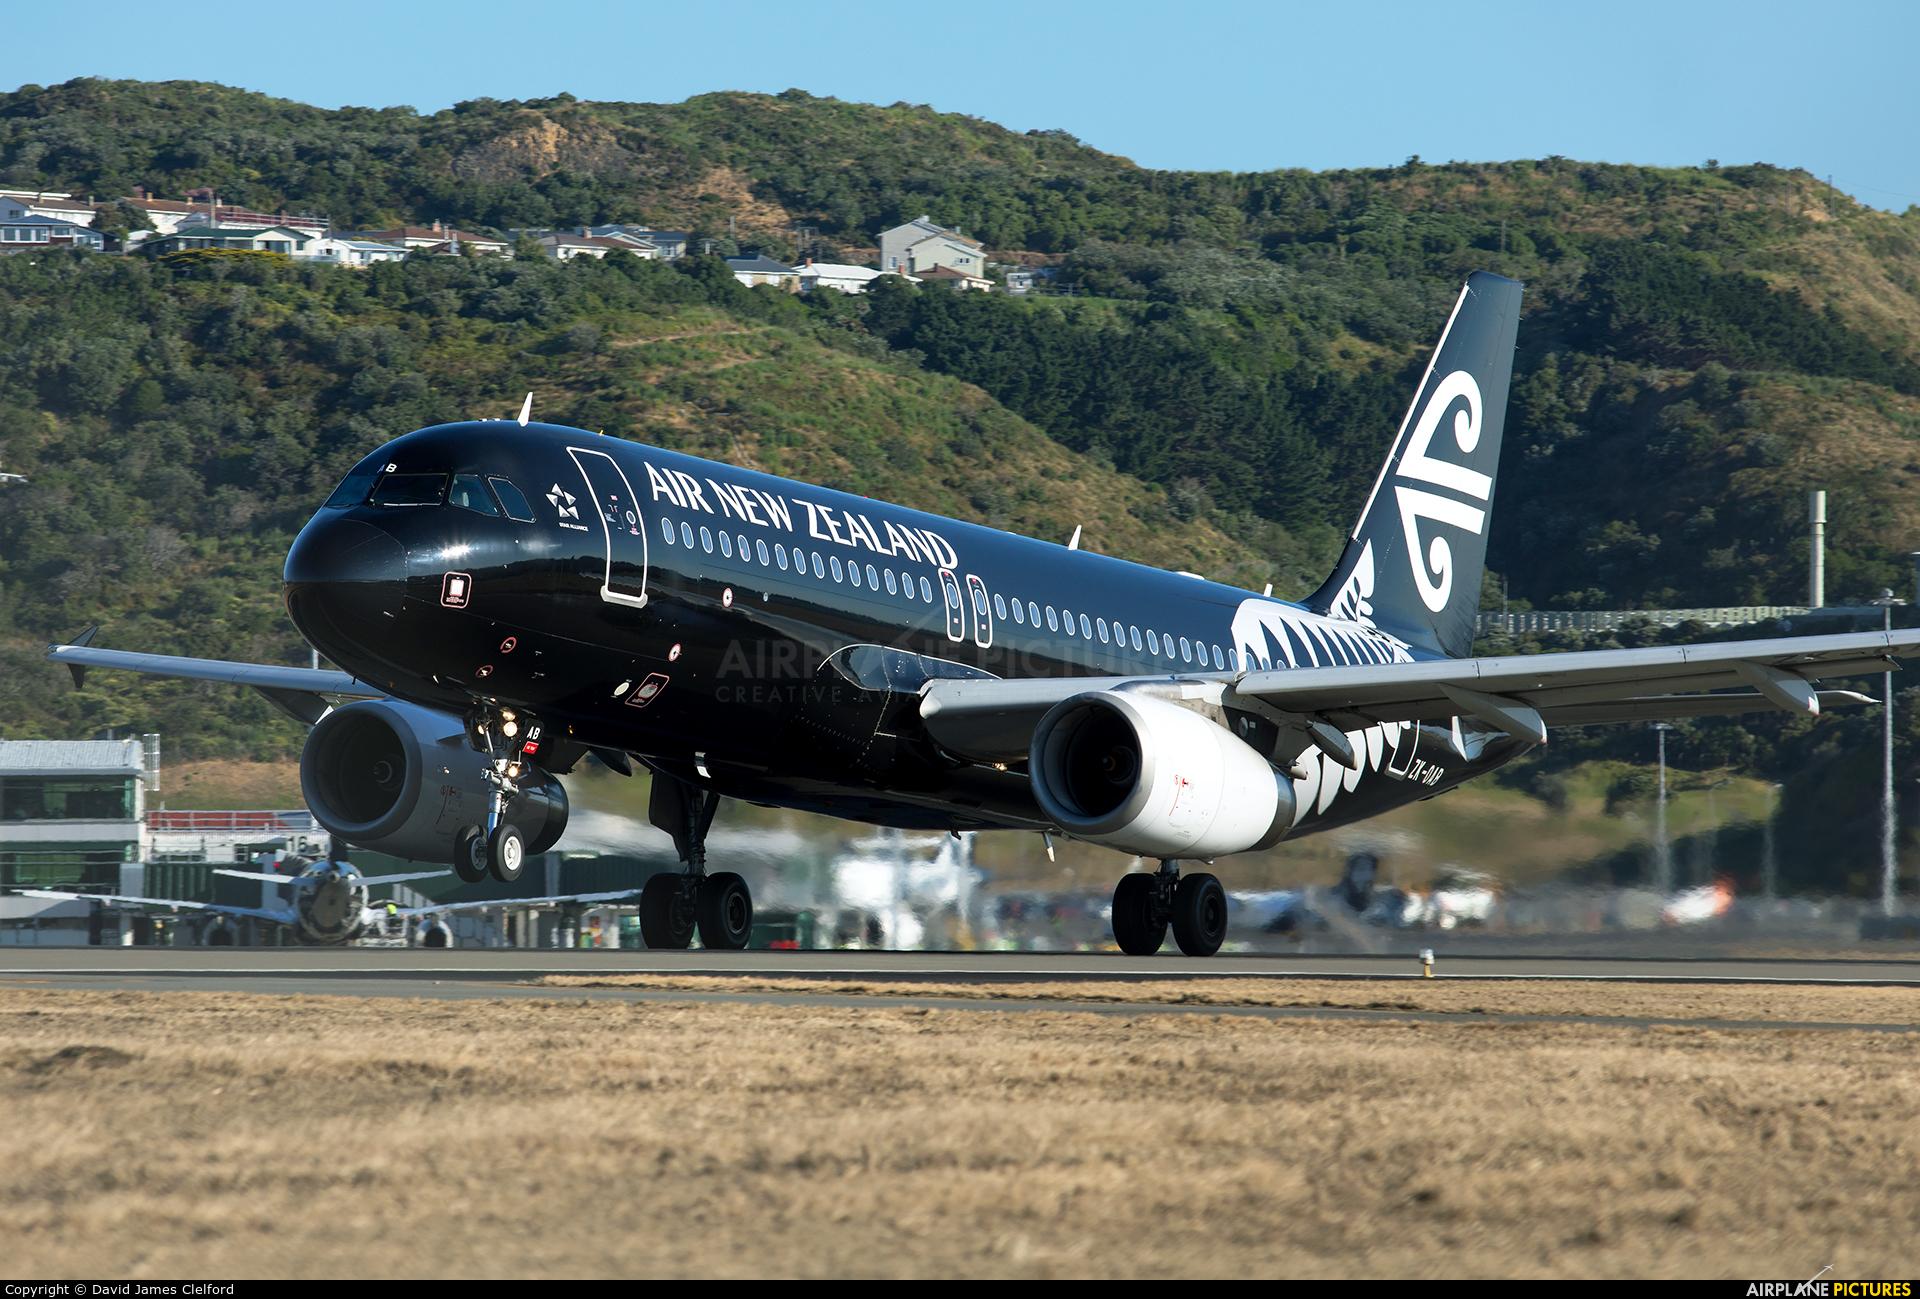 Air New Zealand ZK-OAB aircraft at Wellington Intl